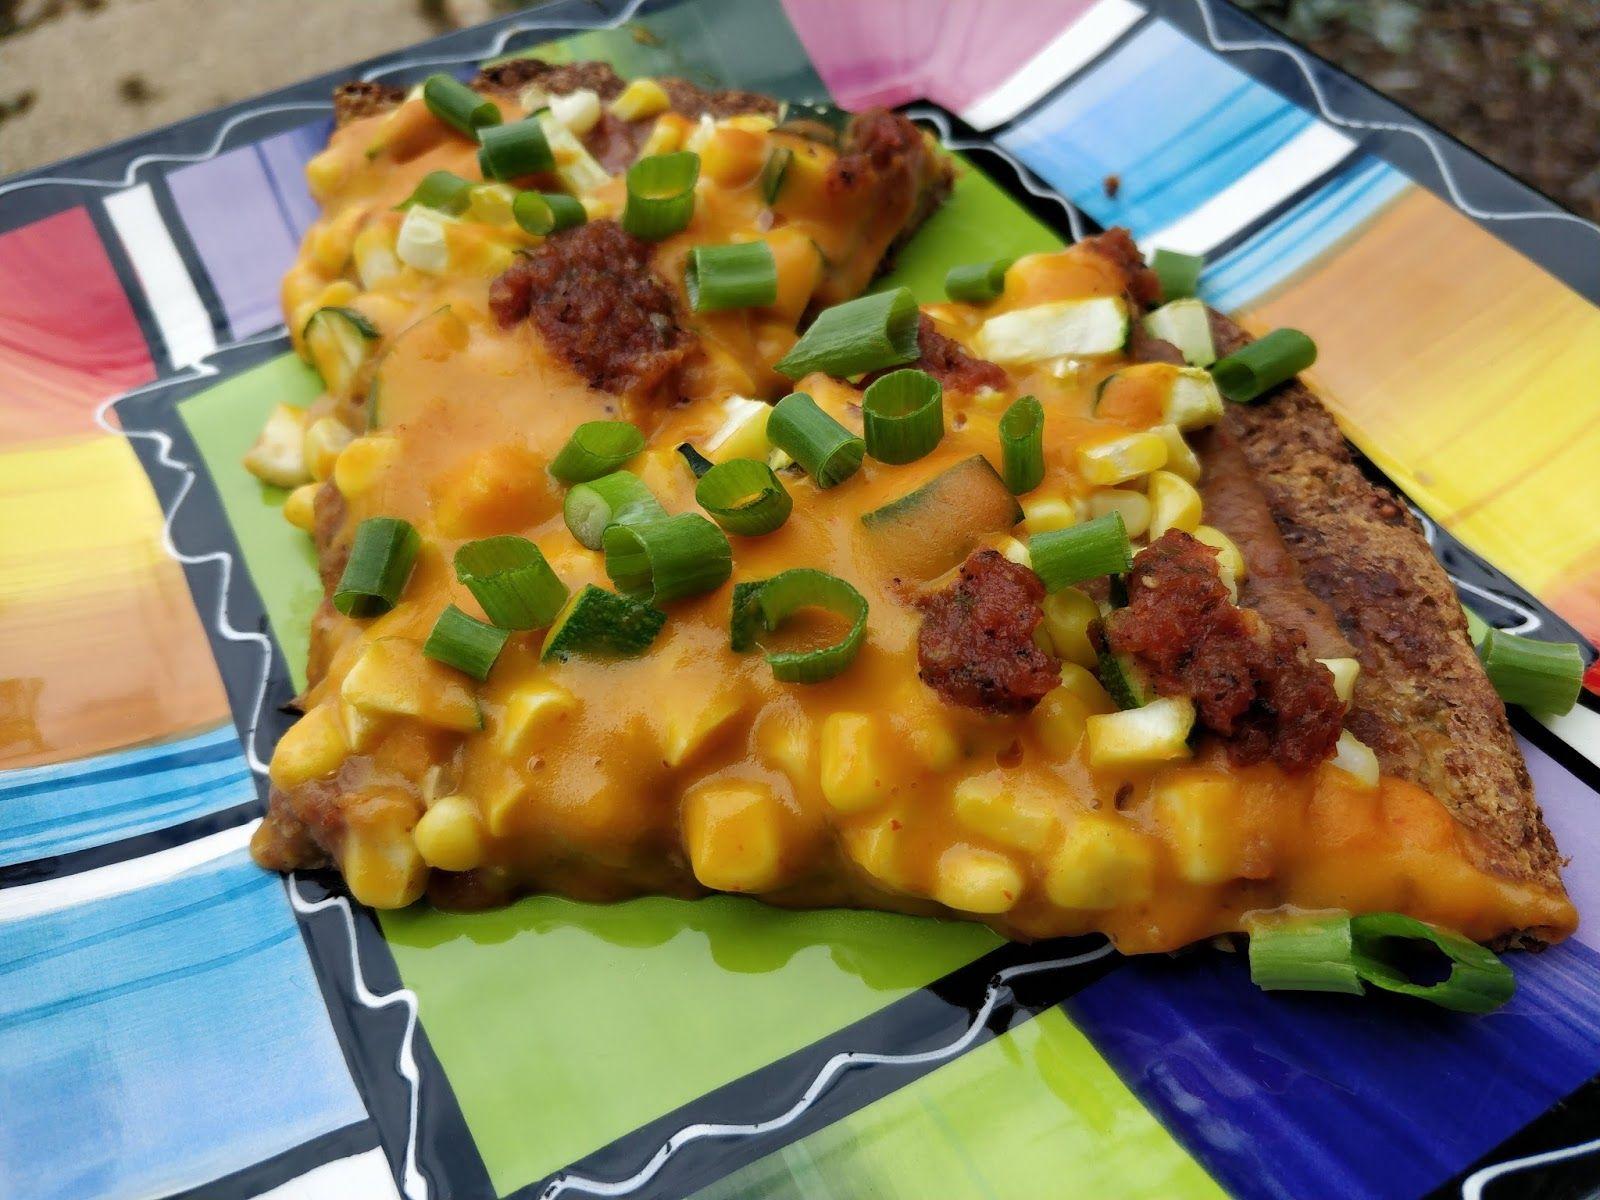 I found a recipe for a cauliflower pizza crust that was ...